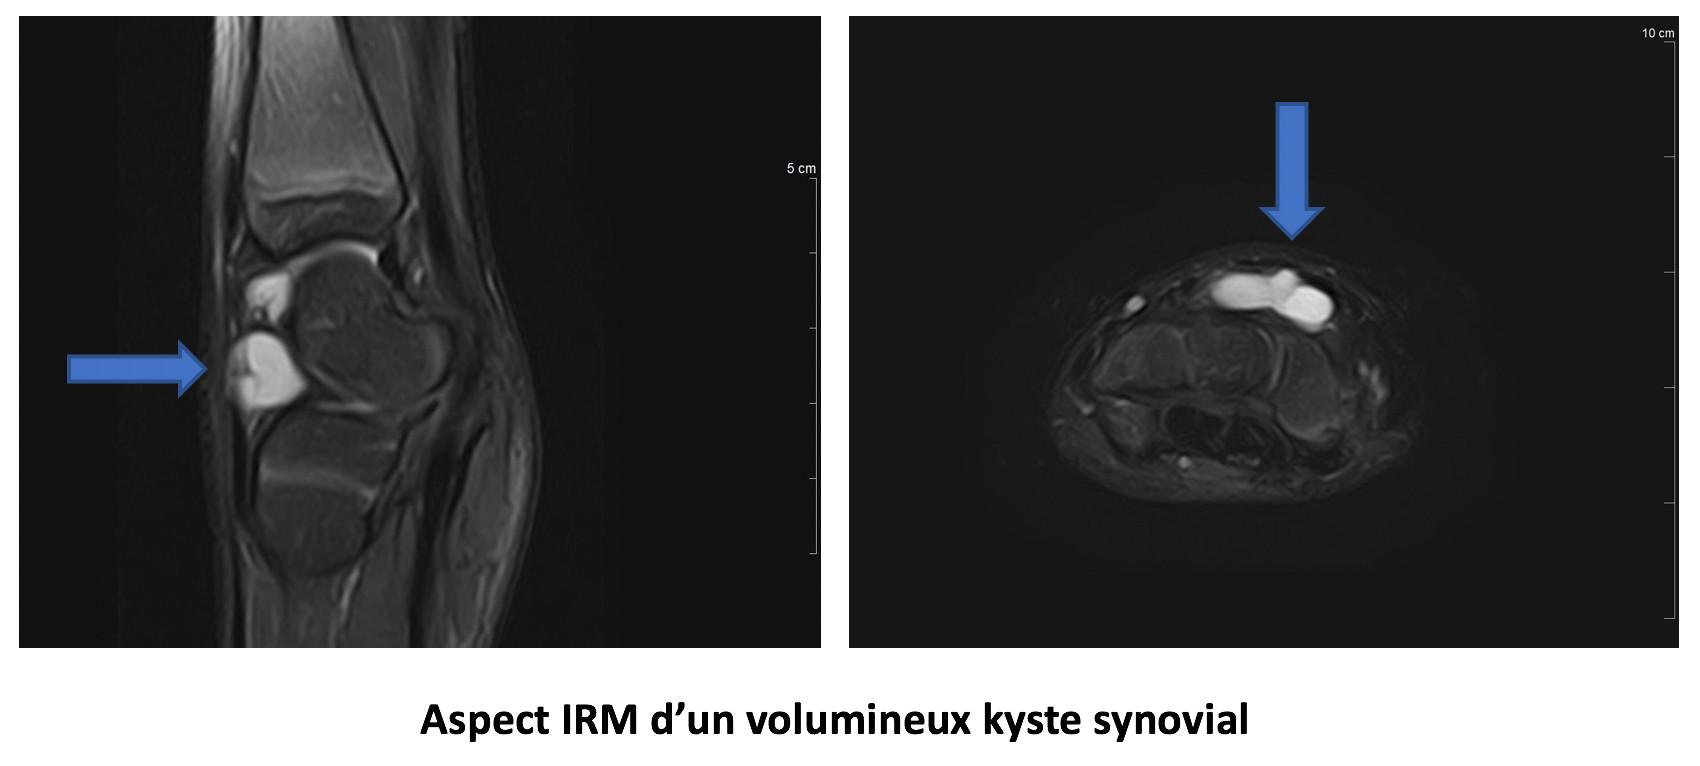 Aspect IRM d'un volumineux kyste synovial